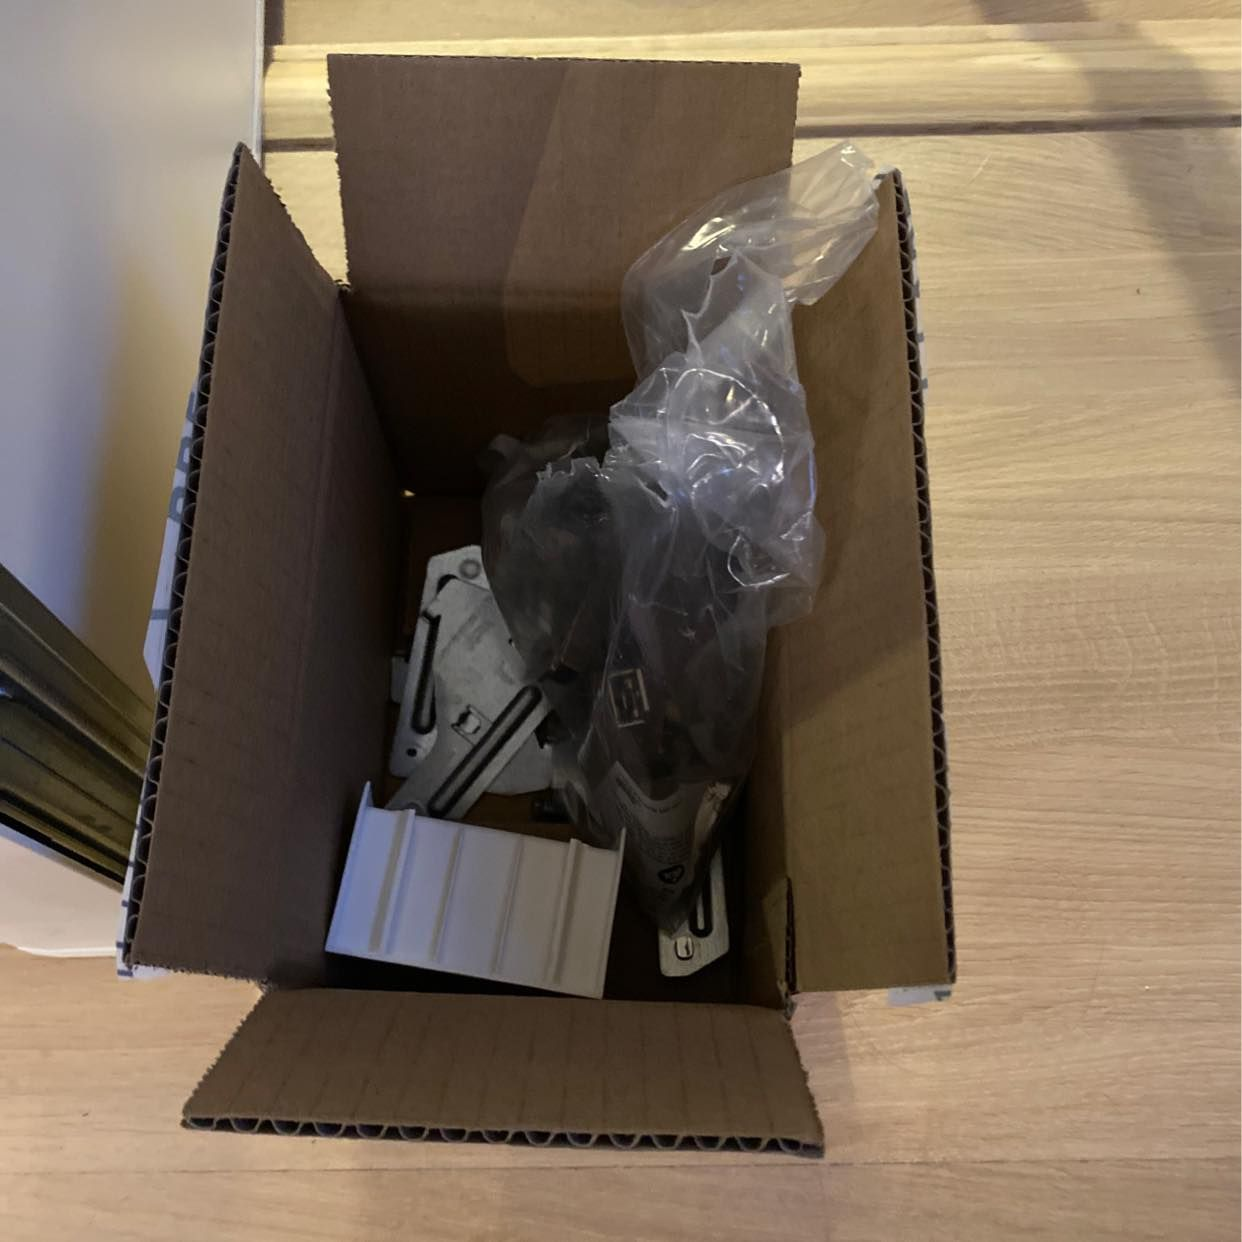 image of Fungerande Ikea låda - Stockholm City